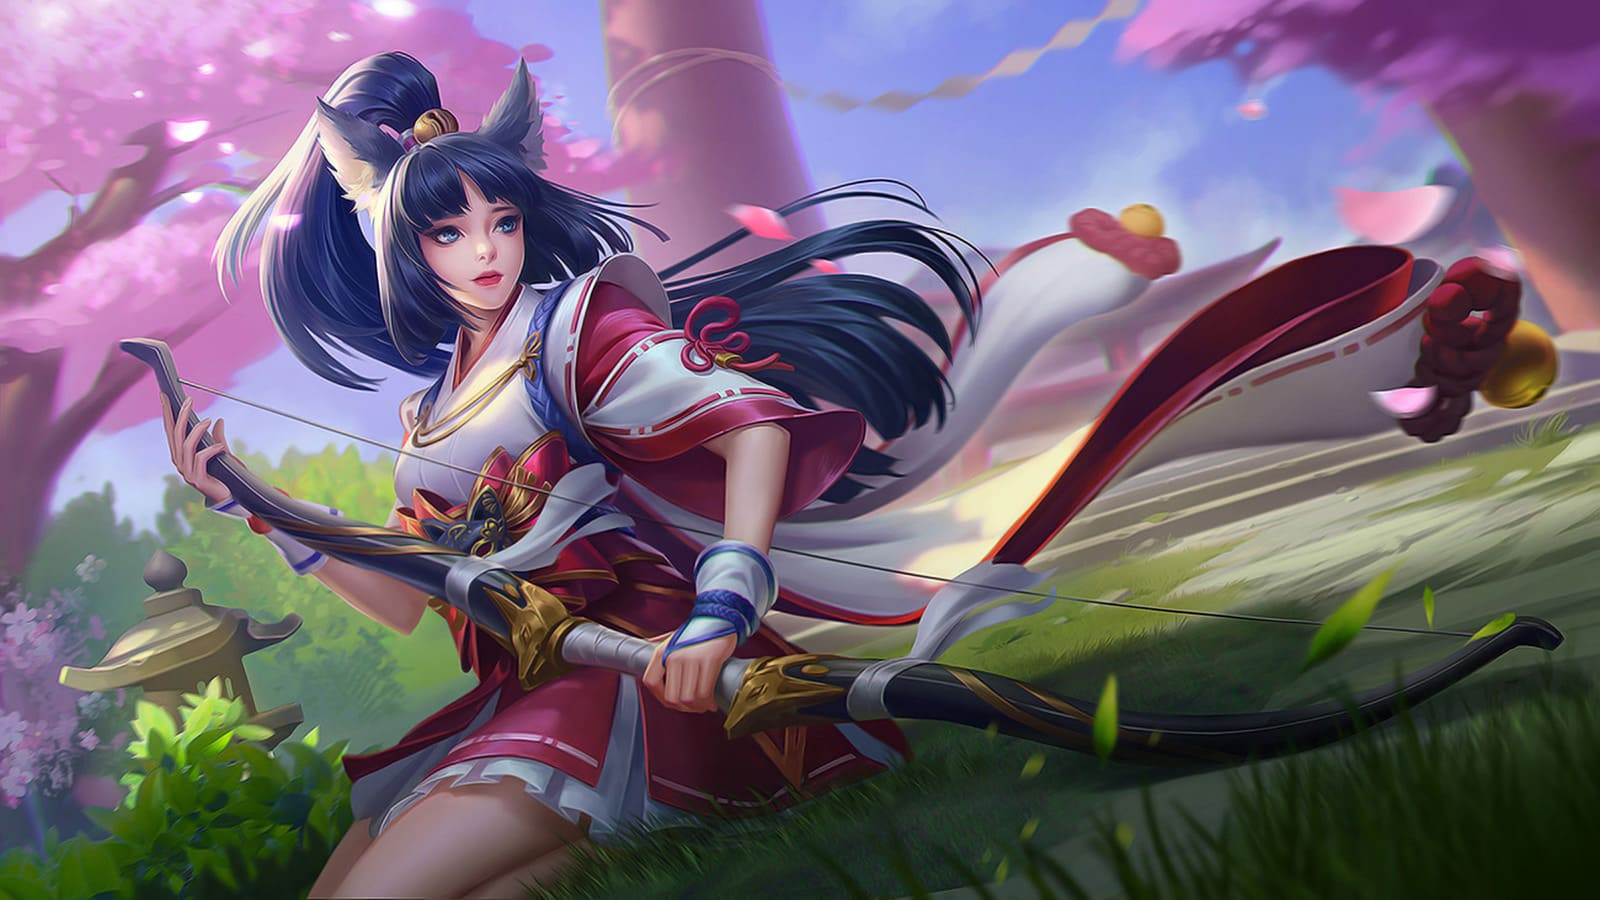 Wallpaper Miya Suzuhime Skin Mobile Legends HD for PC